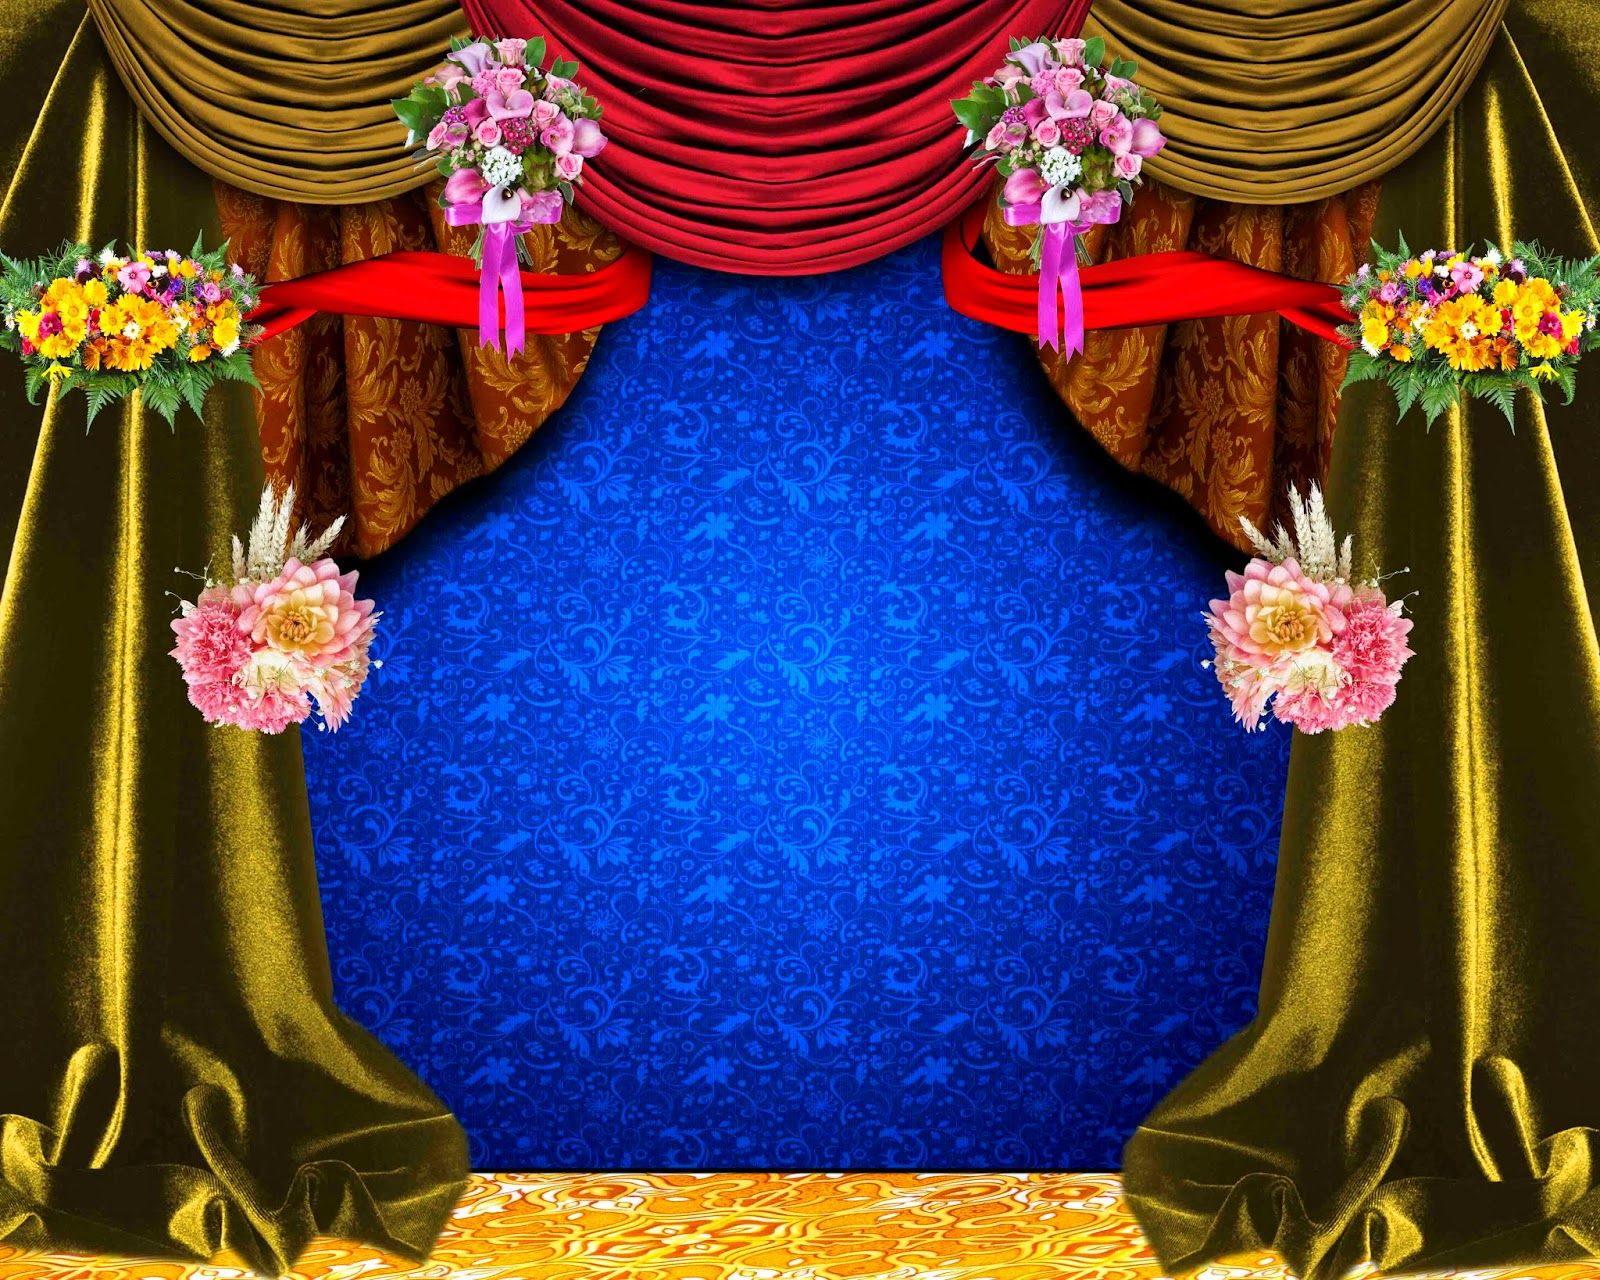 Latest updates of all types photoshop psd templatesvector templates latest updates of all types photoshop psd templatesvector templateshq stock photos junglespirit Gallery